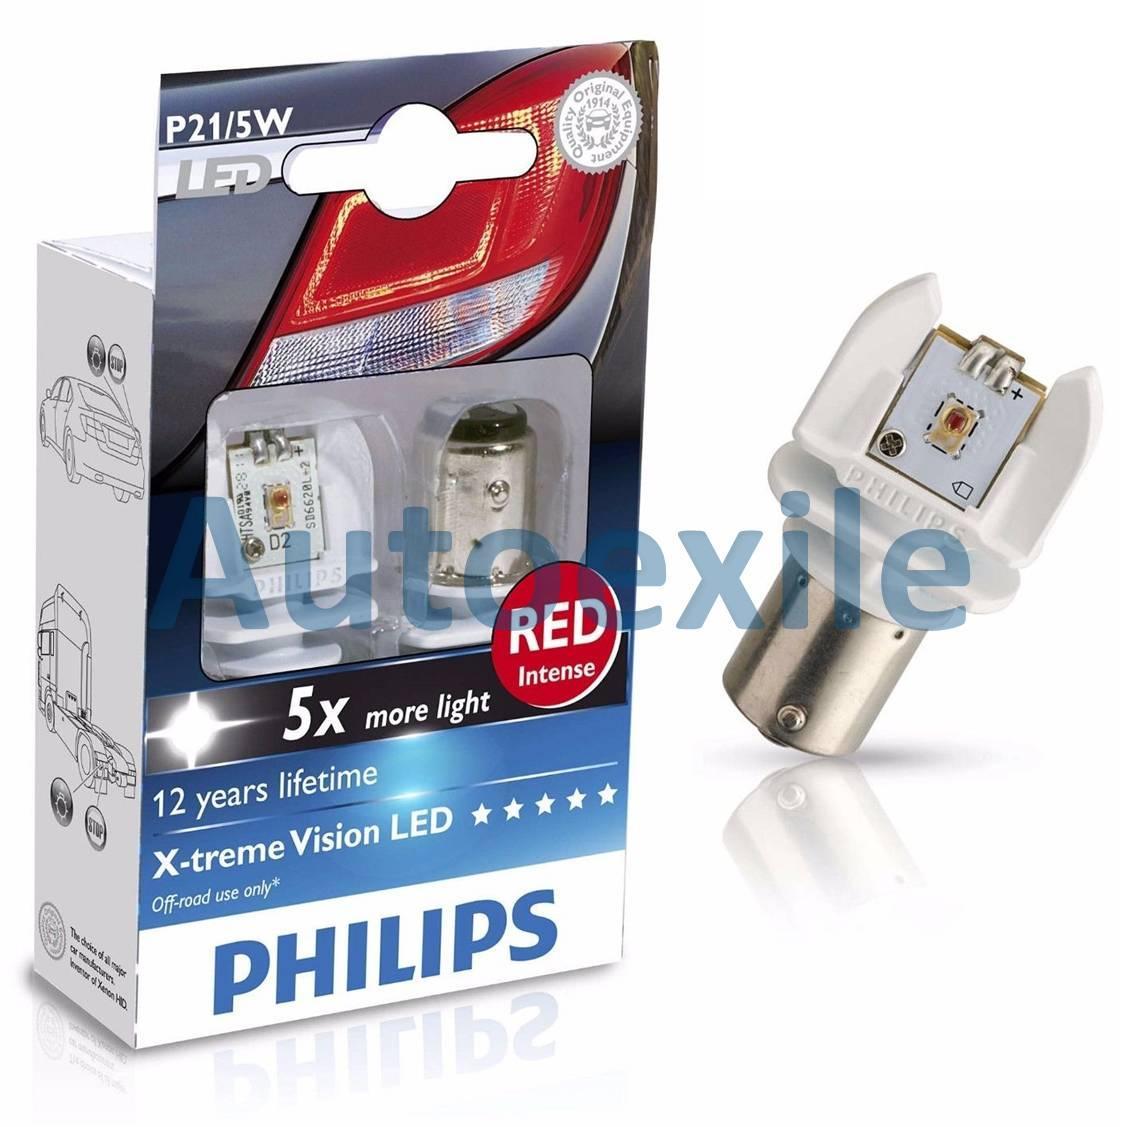 Philips Xtreme Vision LED S25 P21/5W 12V Red Merah Lampu Rem Motor Mobil X-treme